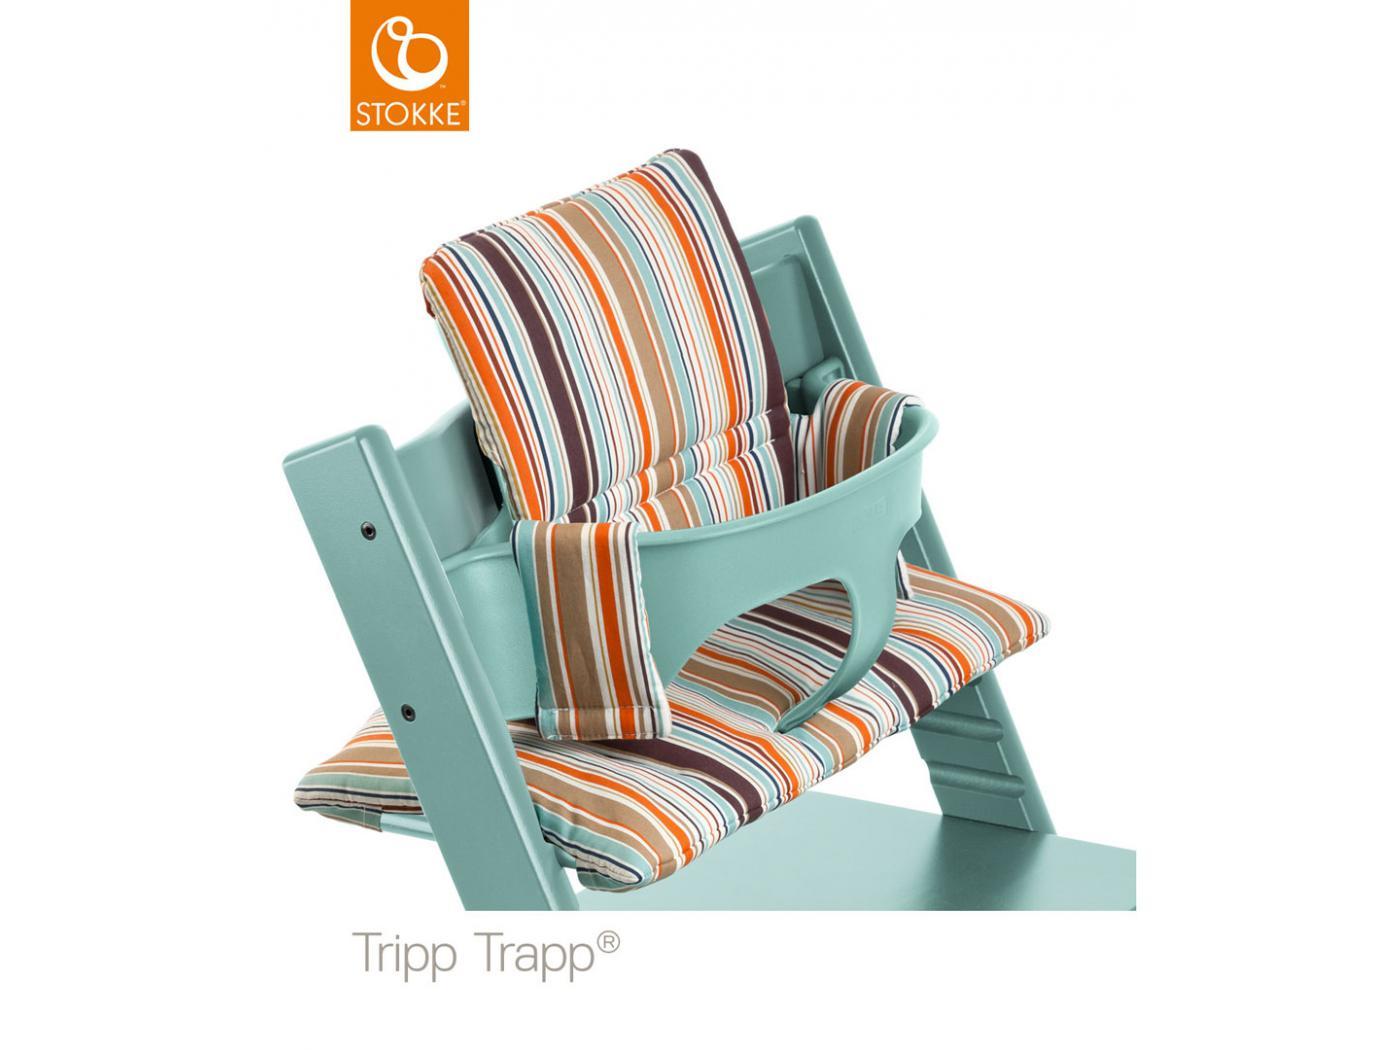 Stokke - Chaise haute Tripp Trapp Bleu Aqua